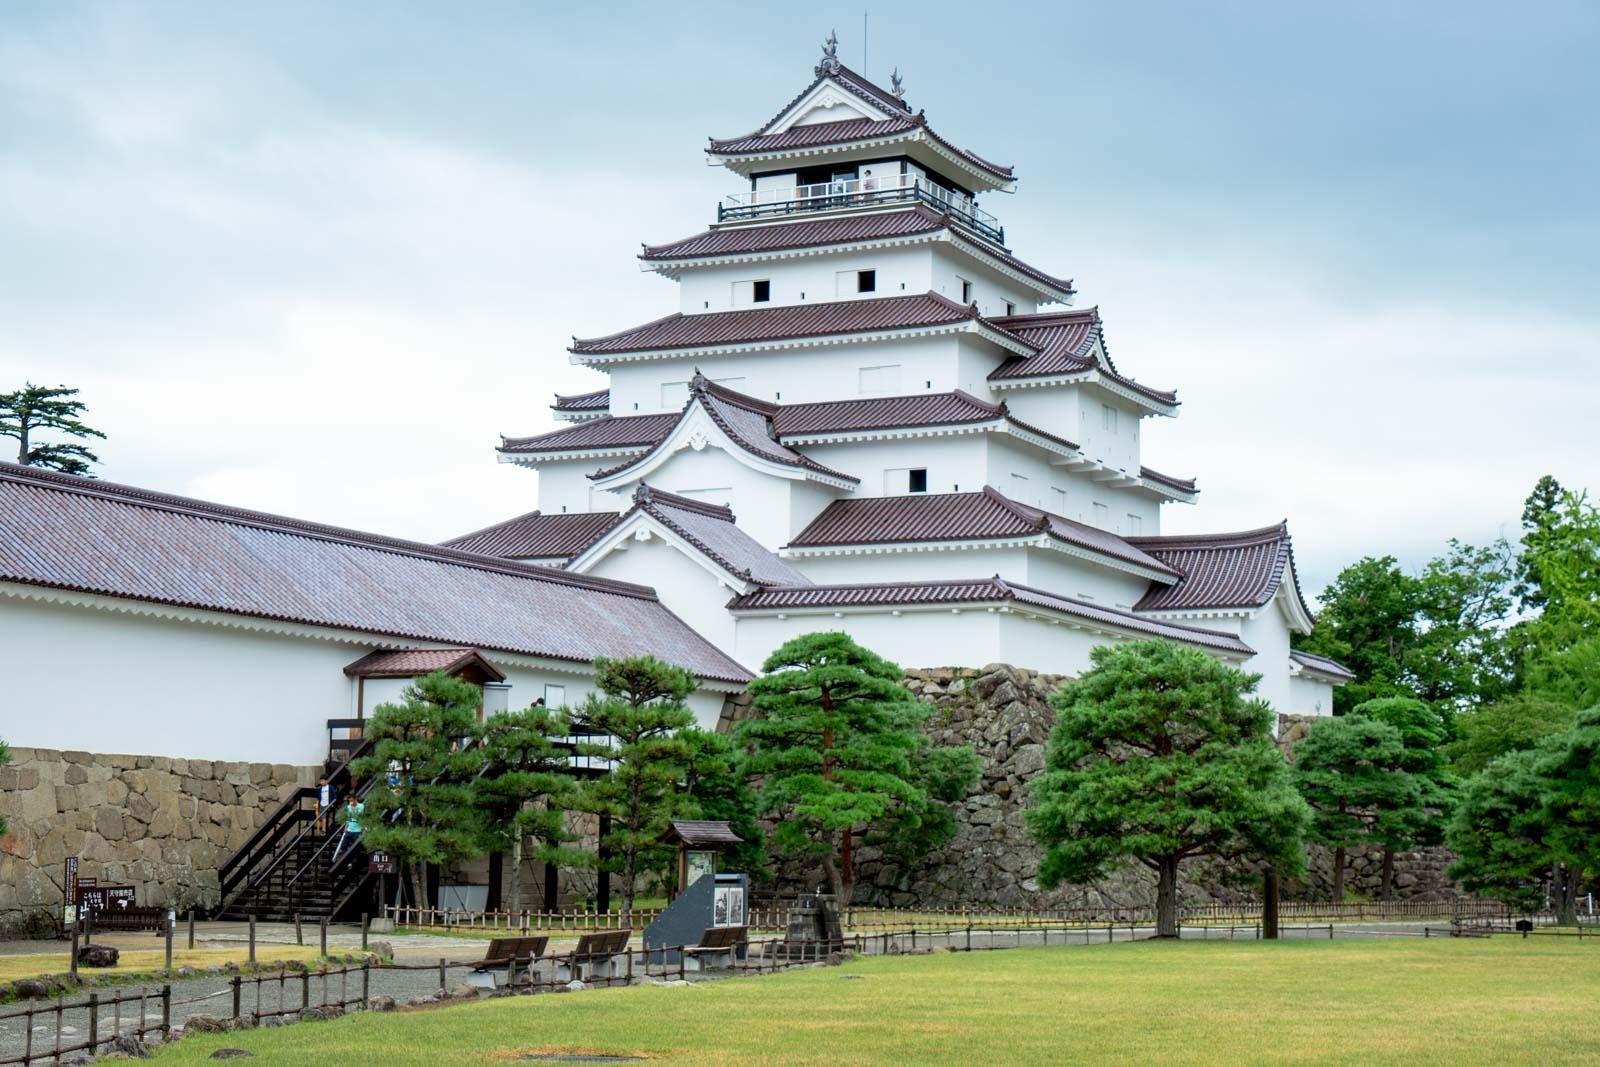 Tsuruga Castle, Aizu, Japan